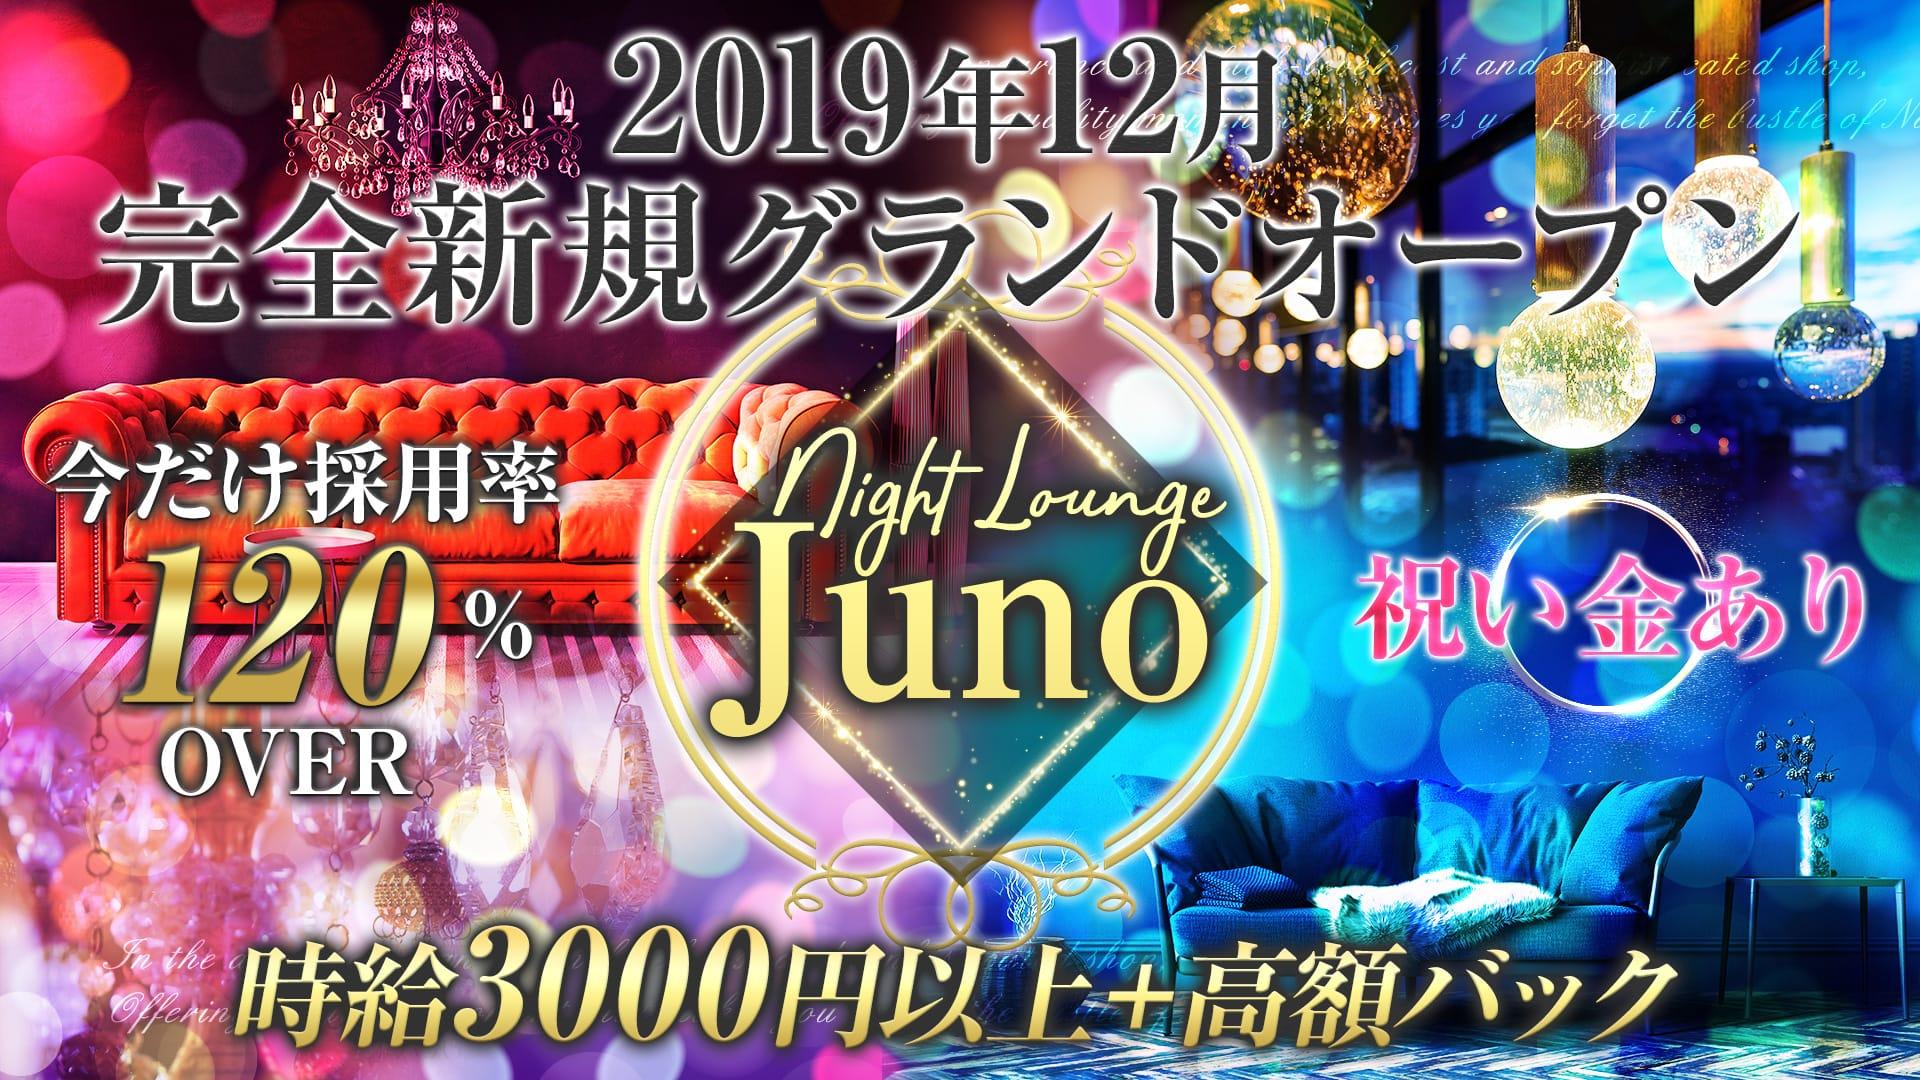 Night Lounge Juno (ジュノ) 殿町ラウンジ TOP画像